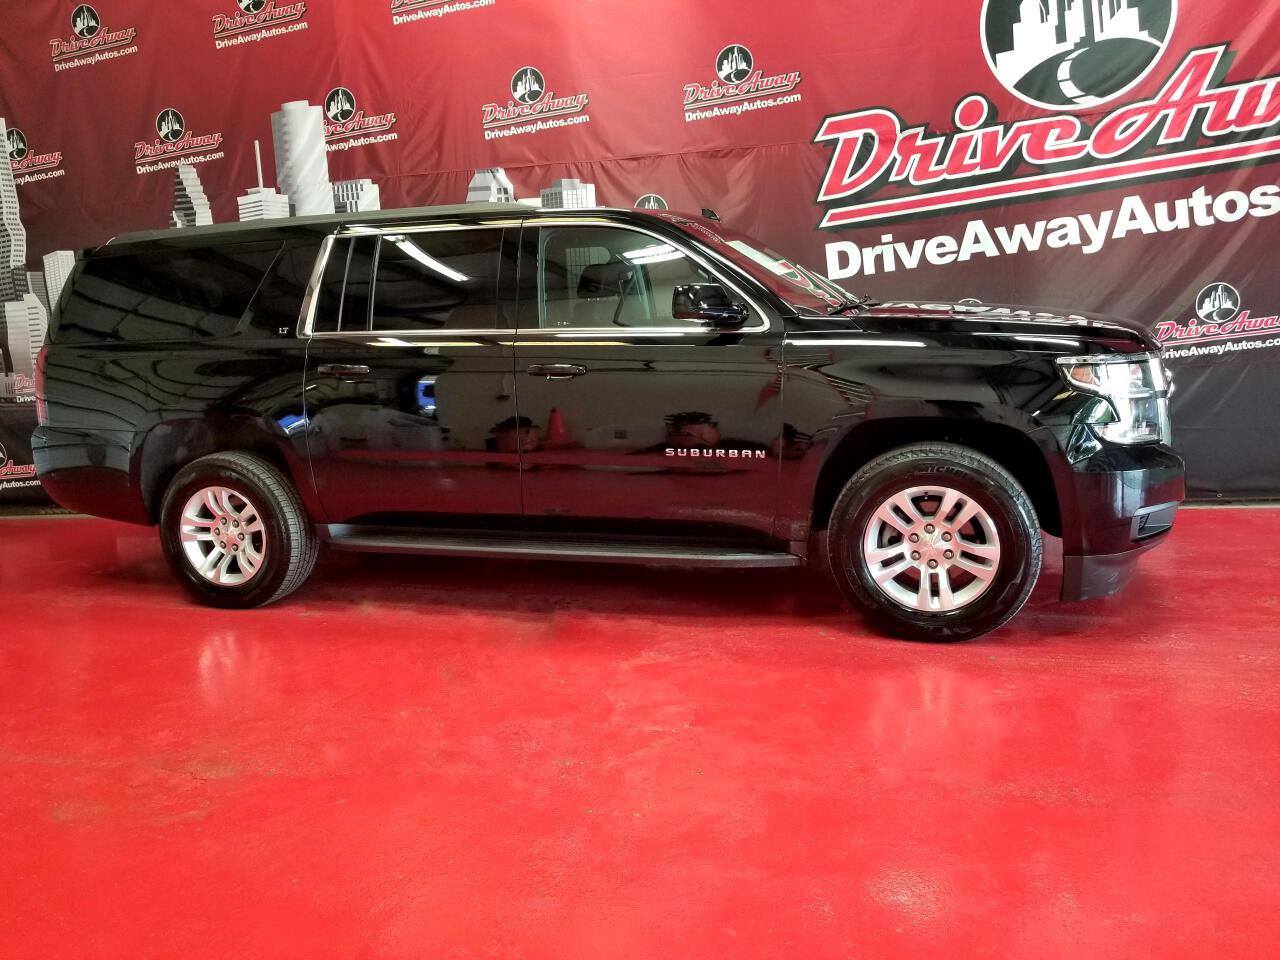 Chevrolet Suburban 2WD 4dr 1500 LT 2019